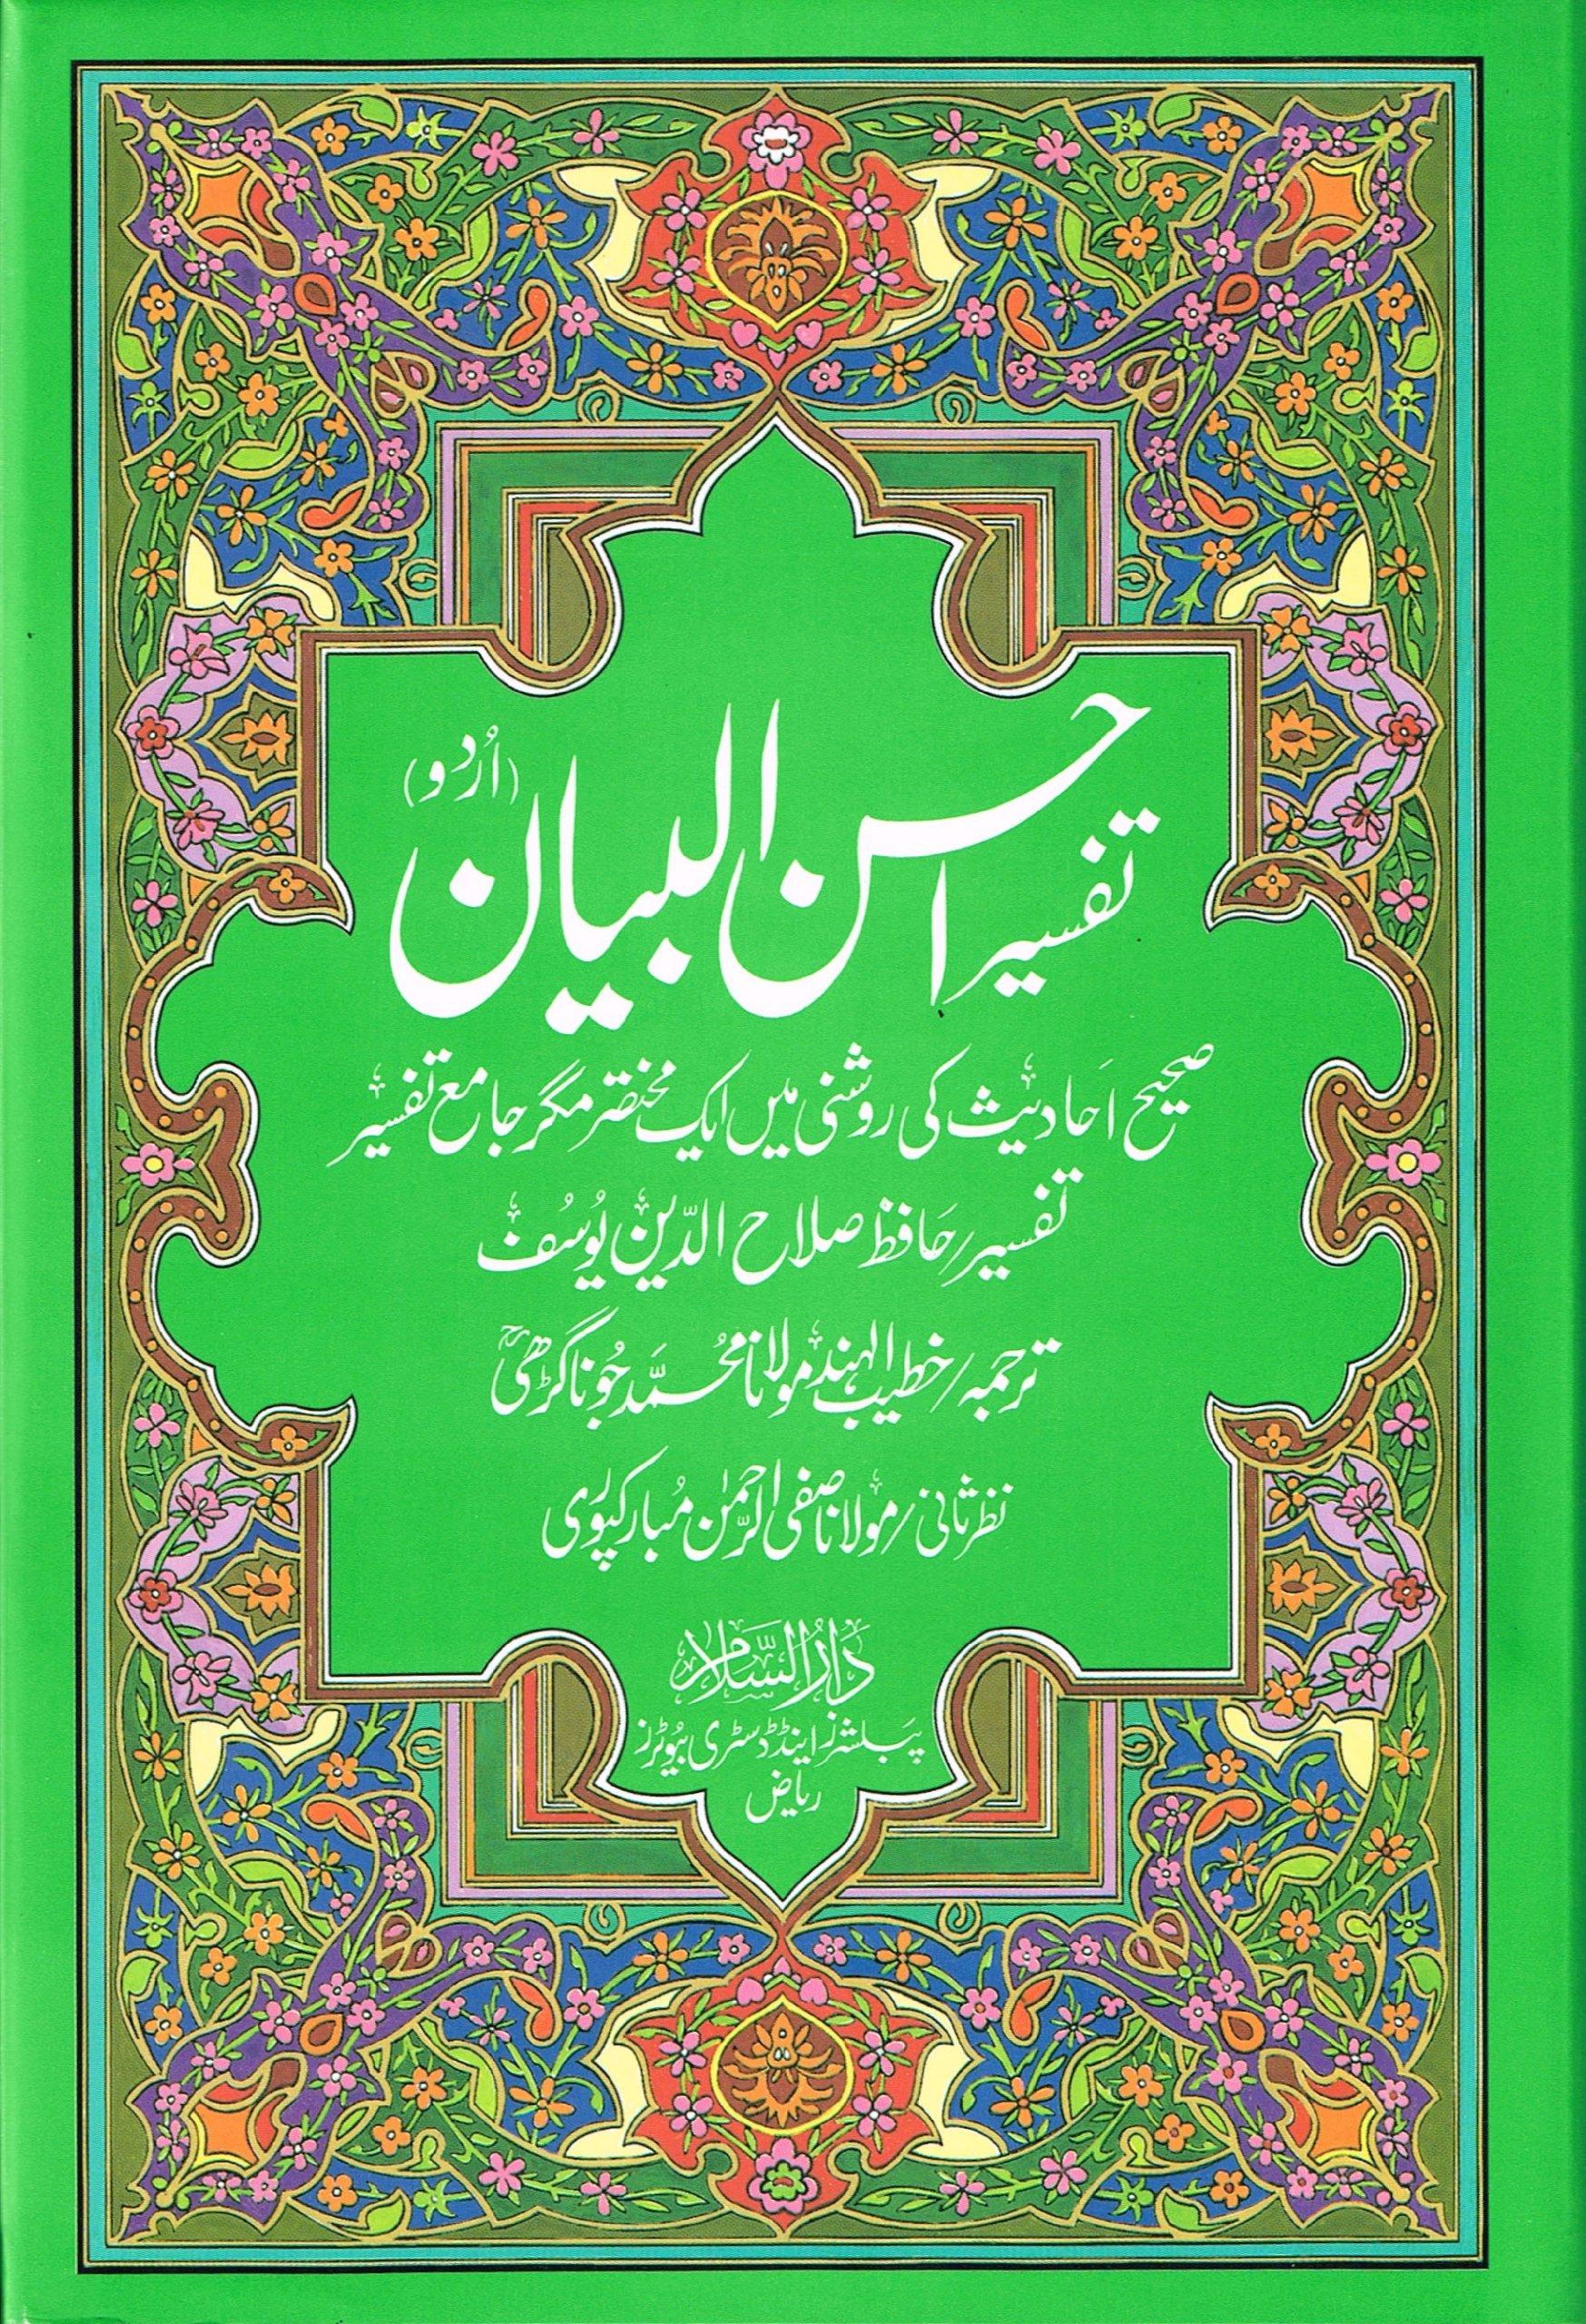 Bayan Ul Quran Urdu Pdf